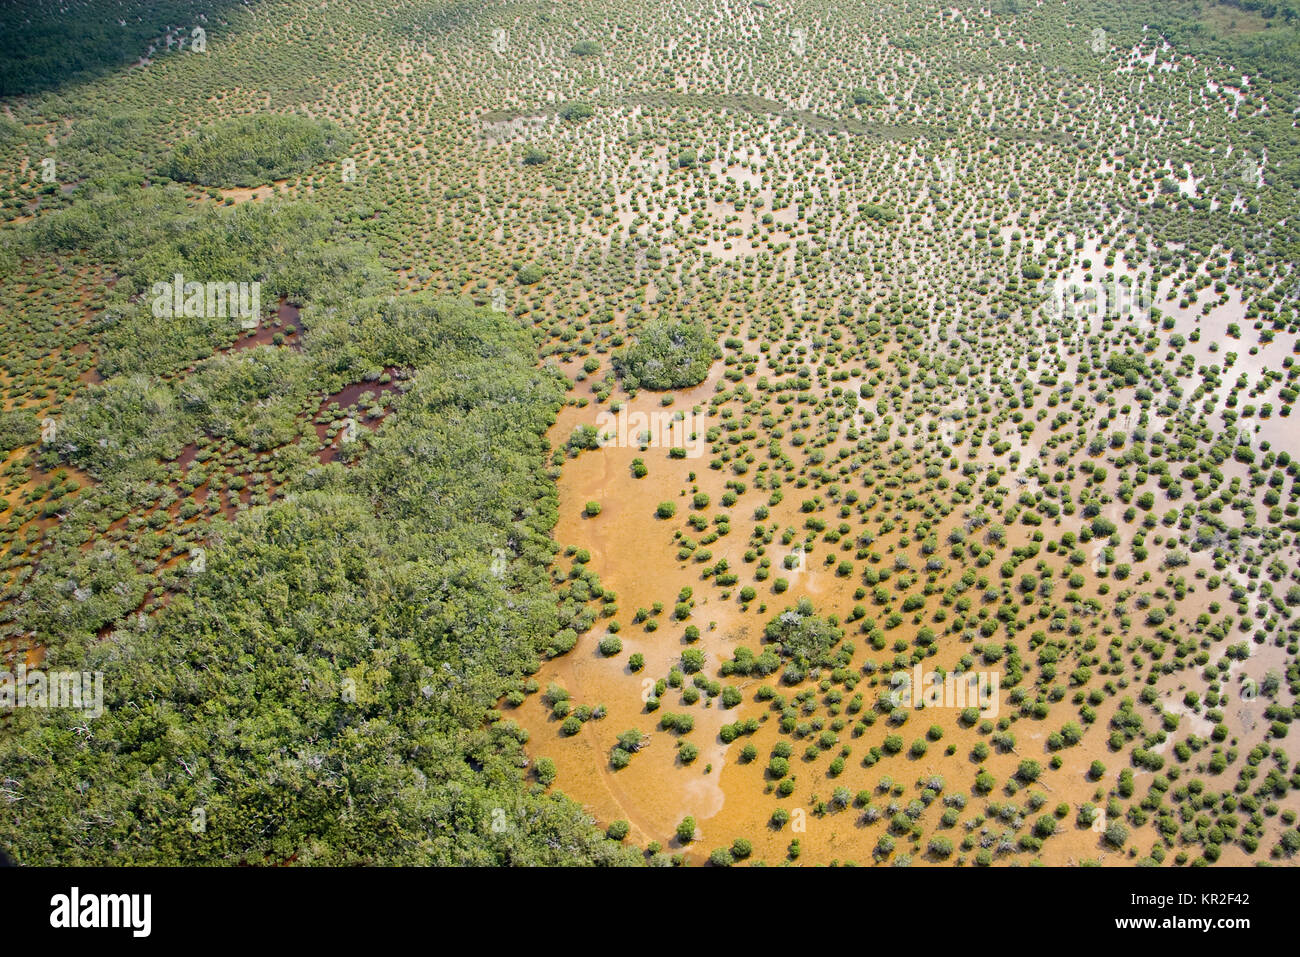 Aerial of Everglades National Park, Florida - Stock Image